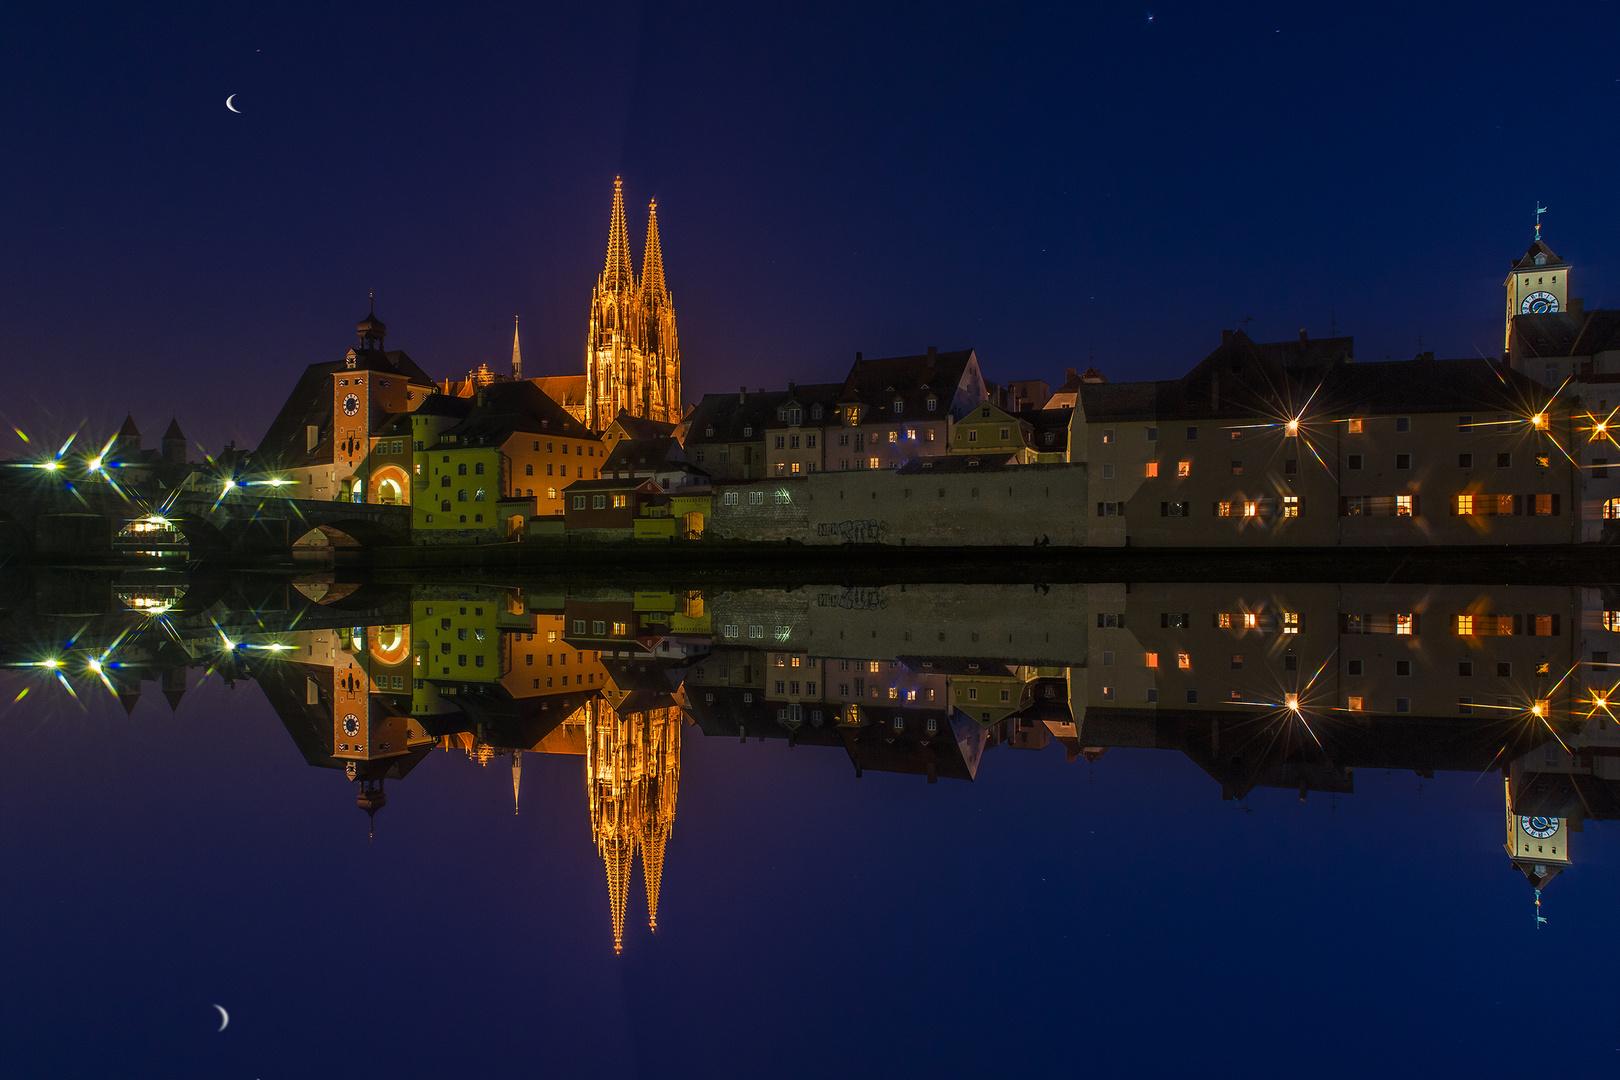 Dom zu Regensburg